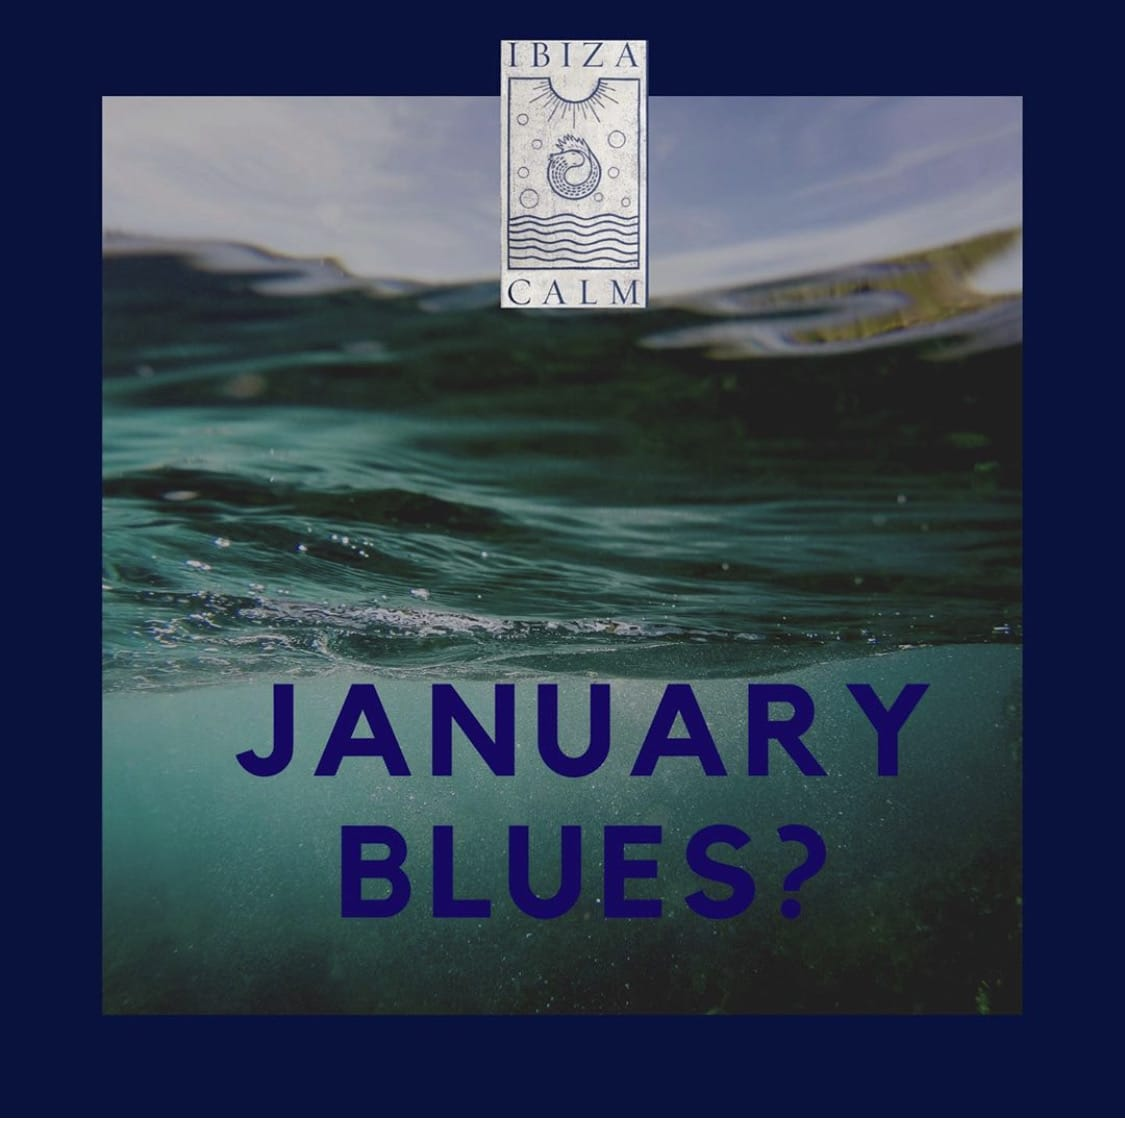 Ibiza Calm - Reflecting on January